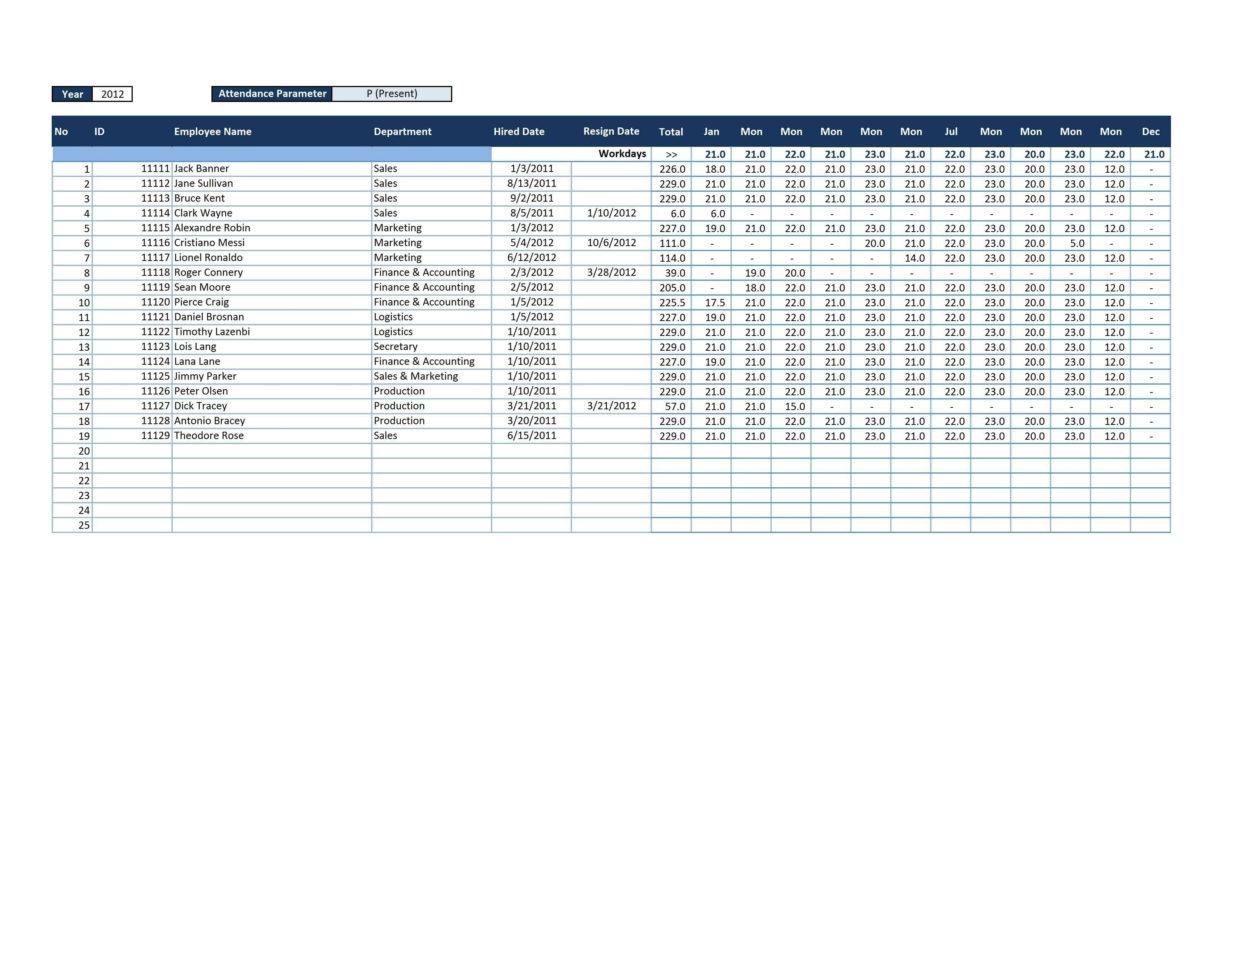 Employee Attendance Point System Spreadsheet For Employee Attendance Point System Spreadsheet Examples Calendar Excel